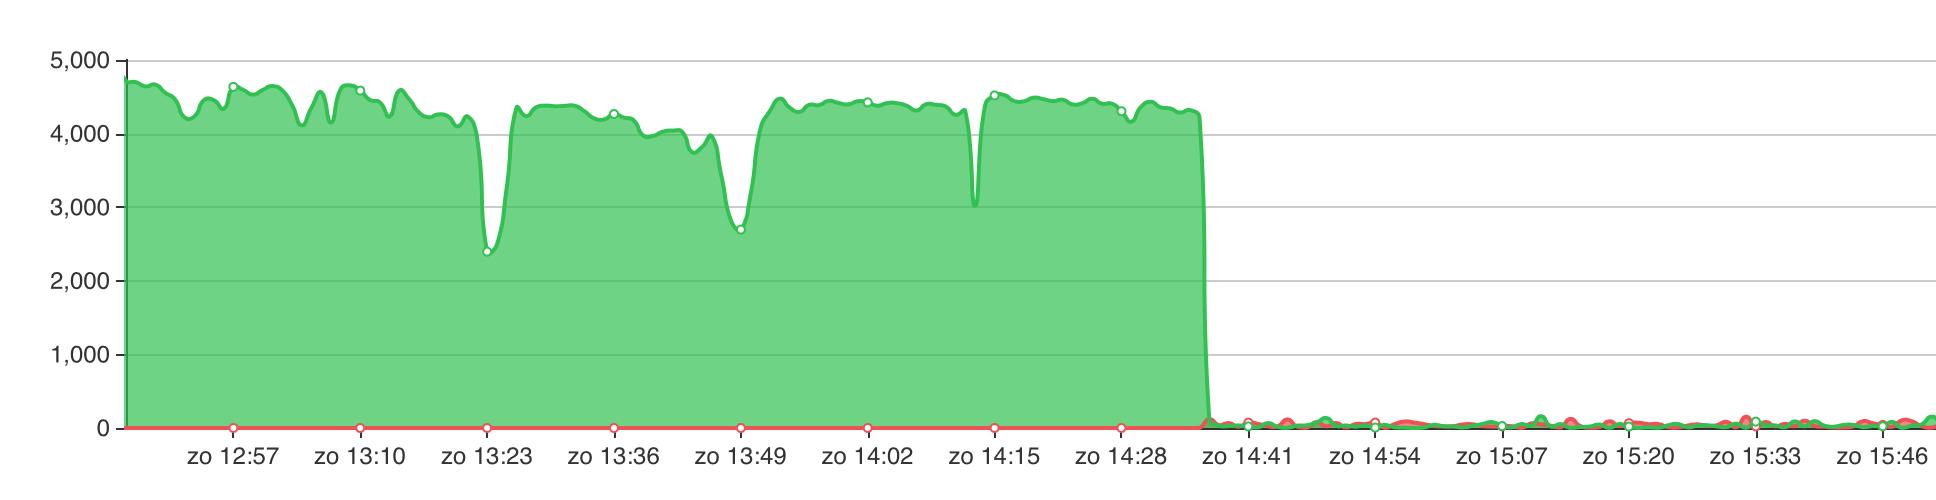 https://tweakers.net/i/gtlayS8uAj8hg74QgRtTmQNvCCs=/full-fit-in/4000x4000/filters:no_upscale():fill(white):strip_exif()/f/image/qjj9MpFjPDgOpqmq3wp7lo8X.png?f=user_large